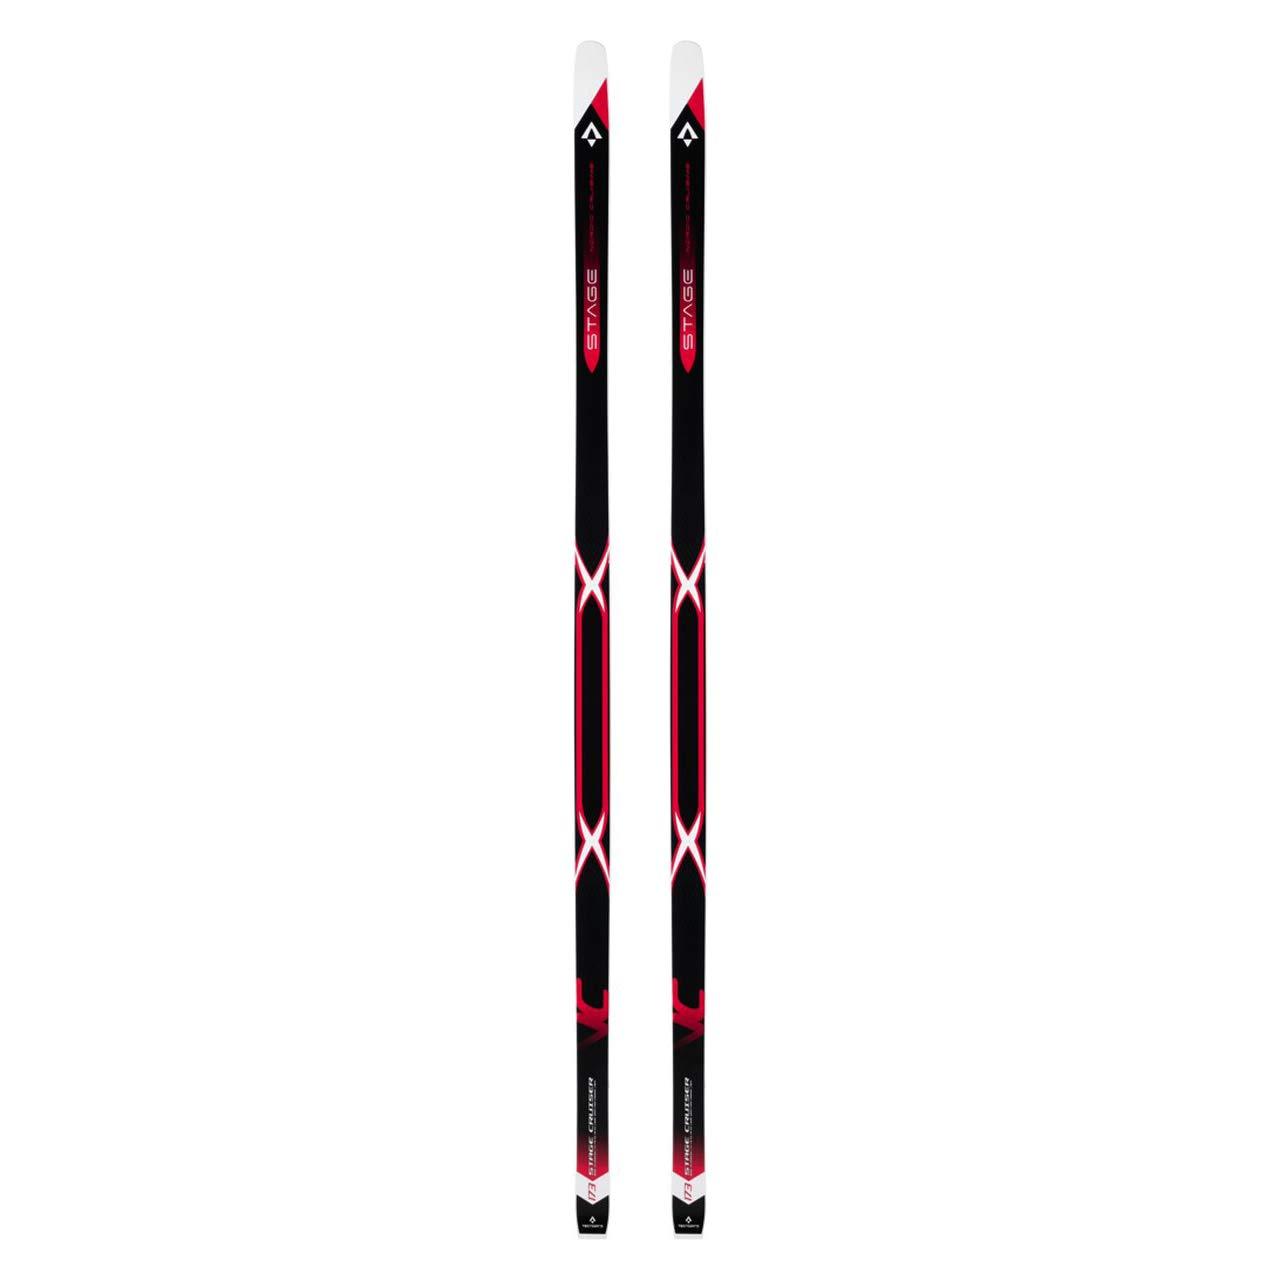 Tecno Pro Langlauf-ski Nc Stage Cruiser Langlaufski